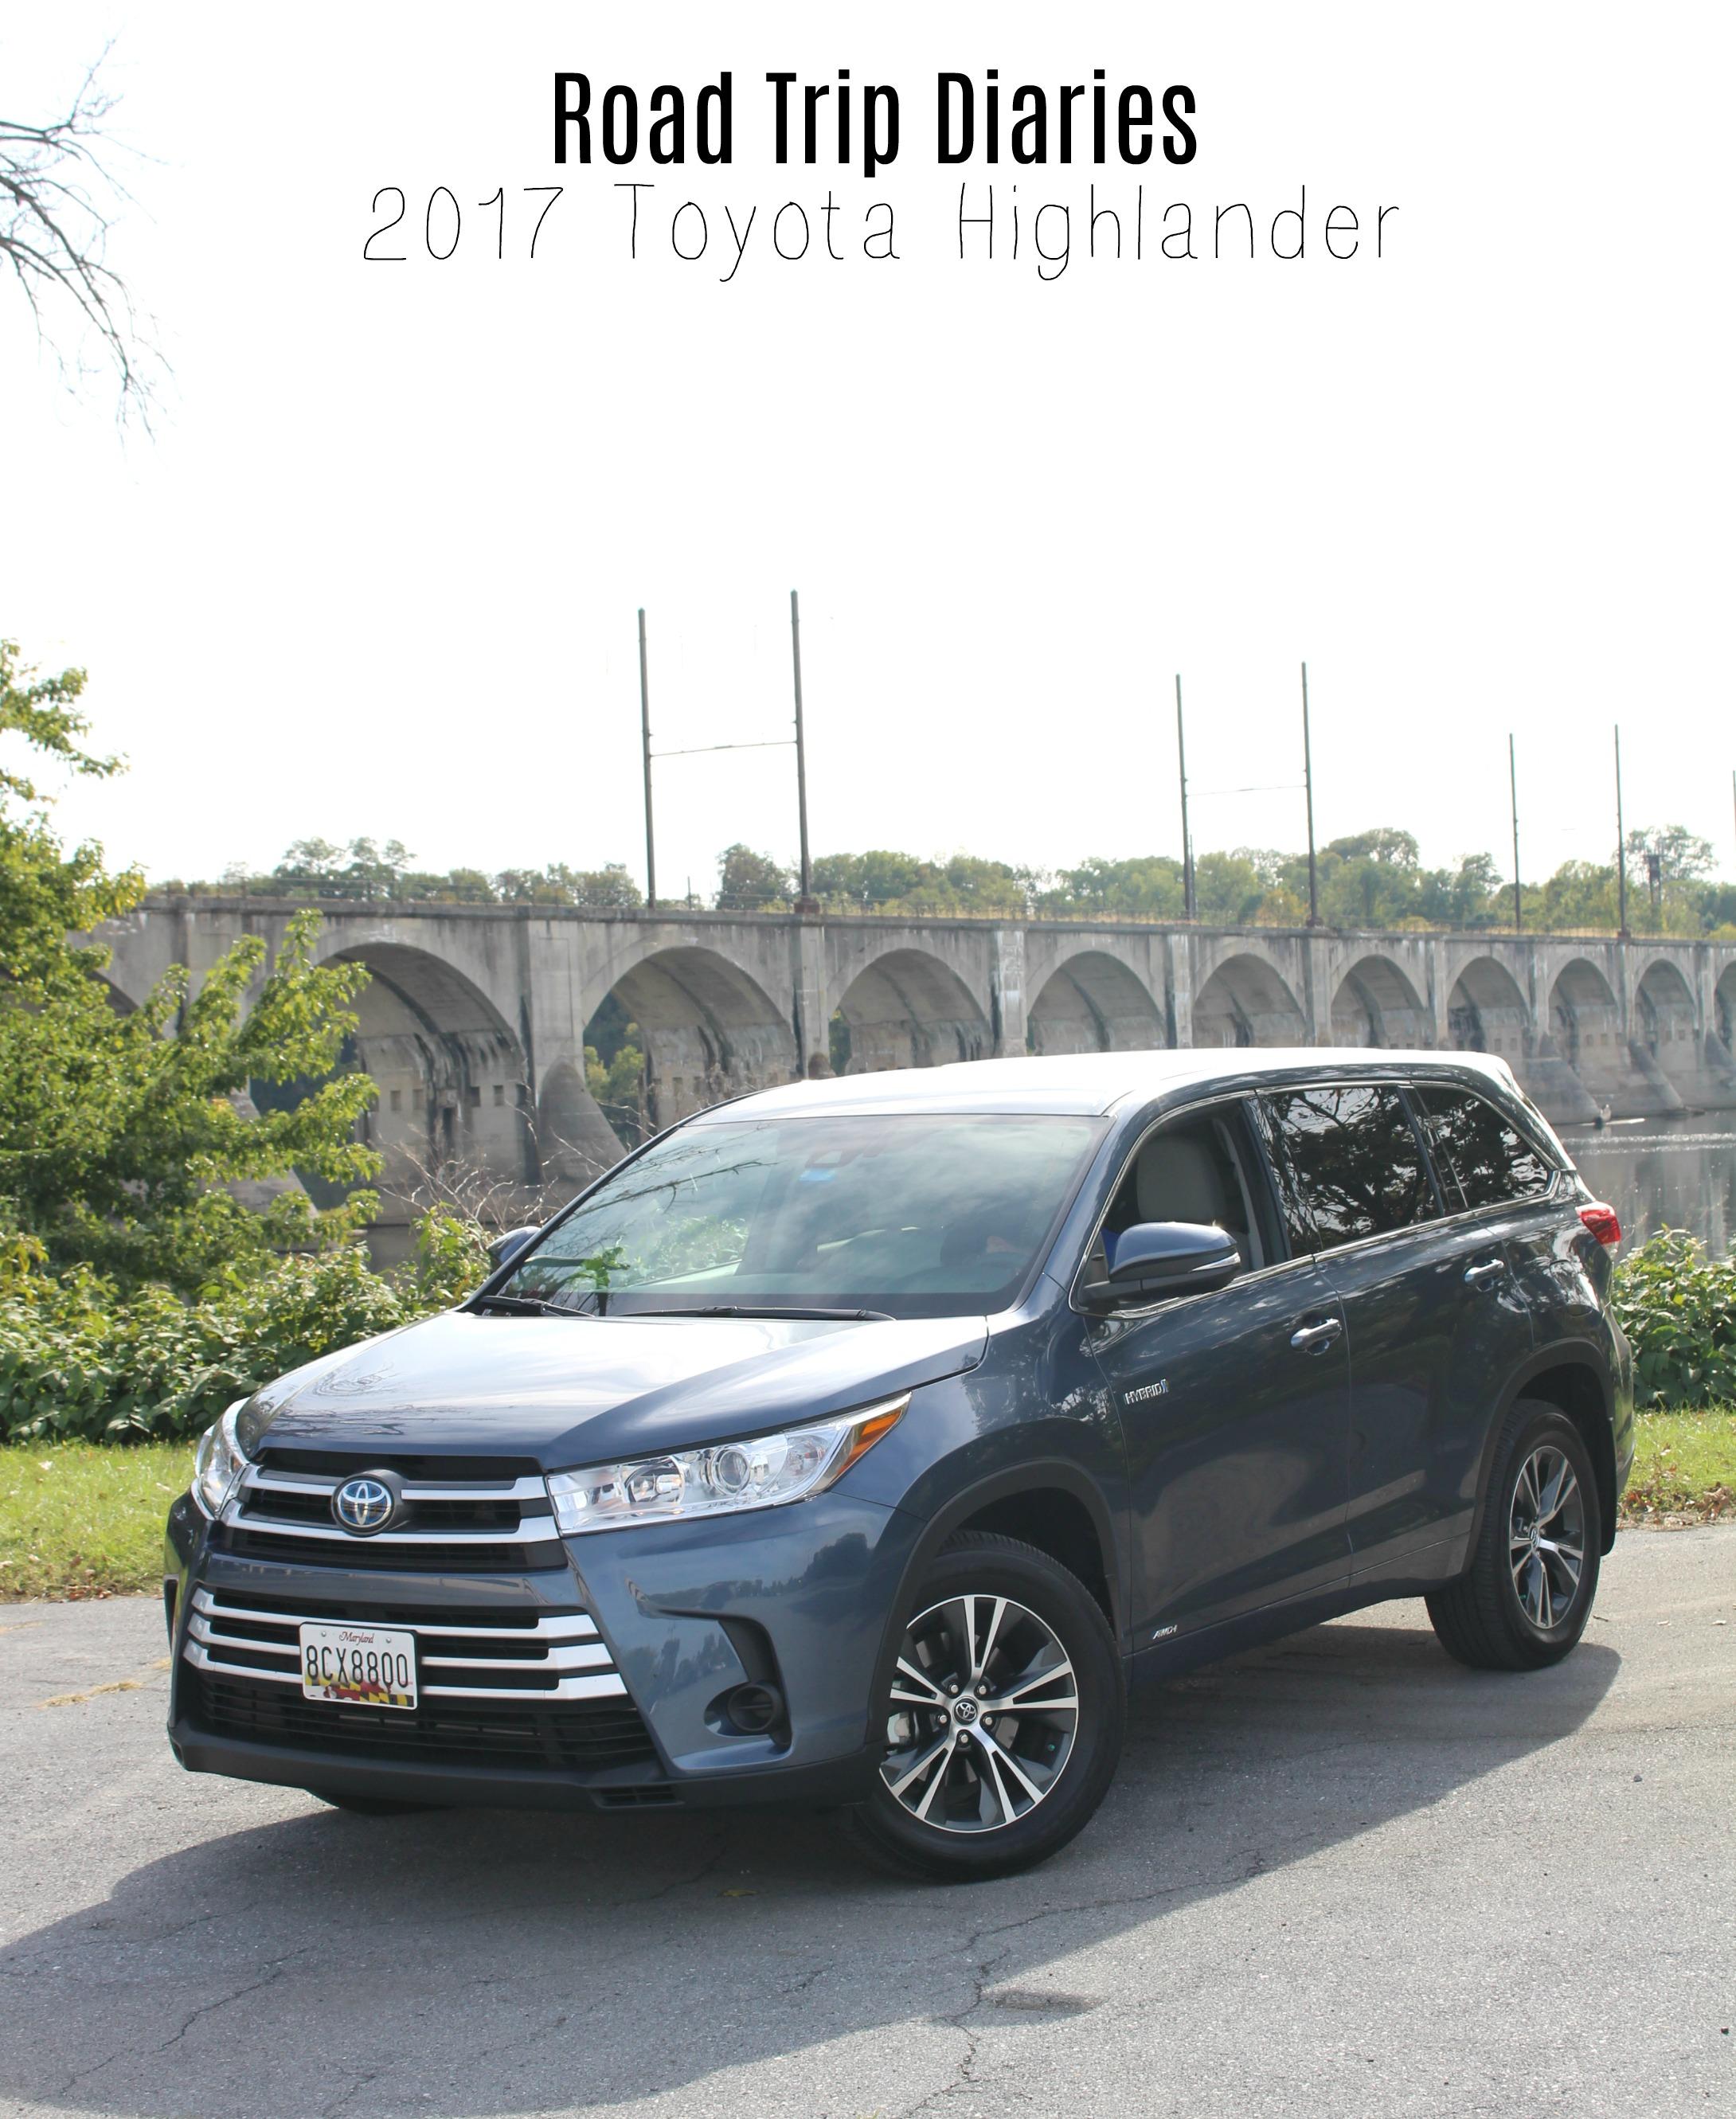 Toyota Highlander Reviews: 2017 Toyota Highlander